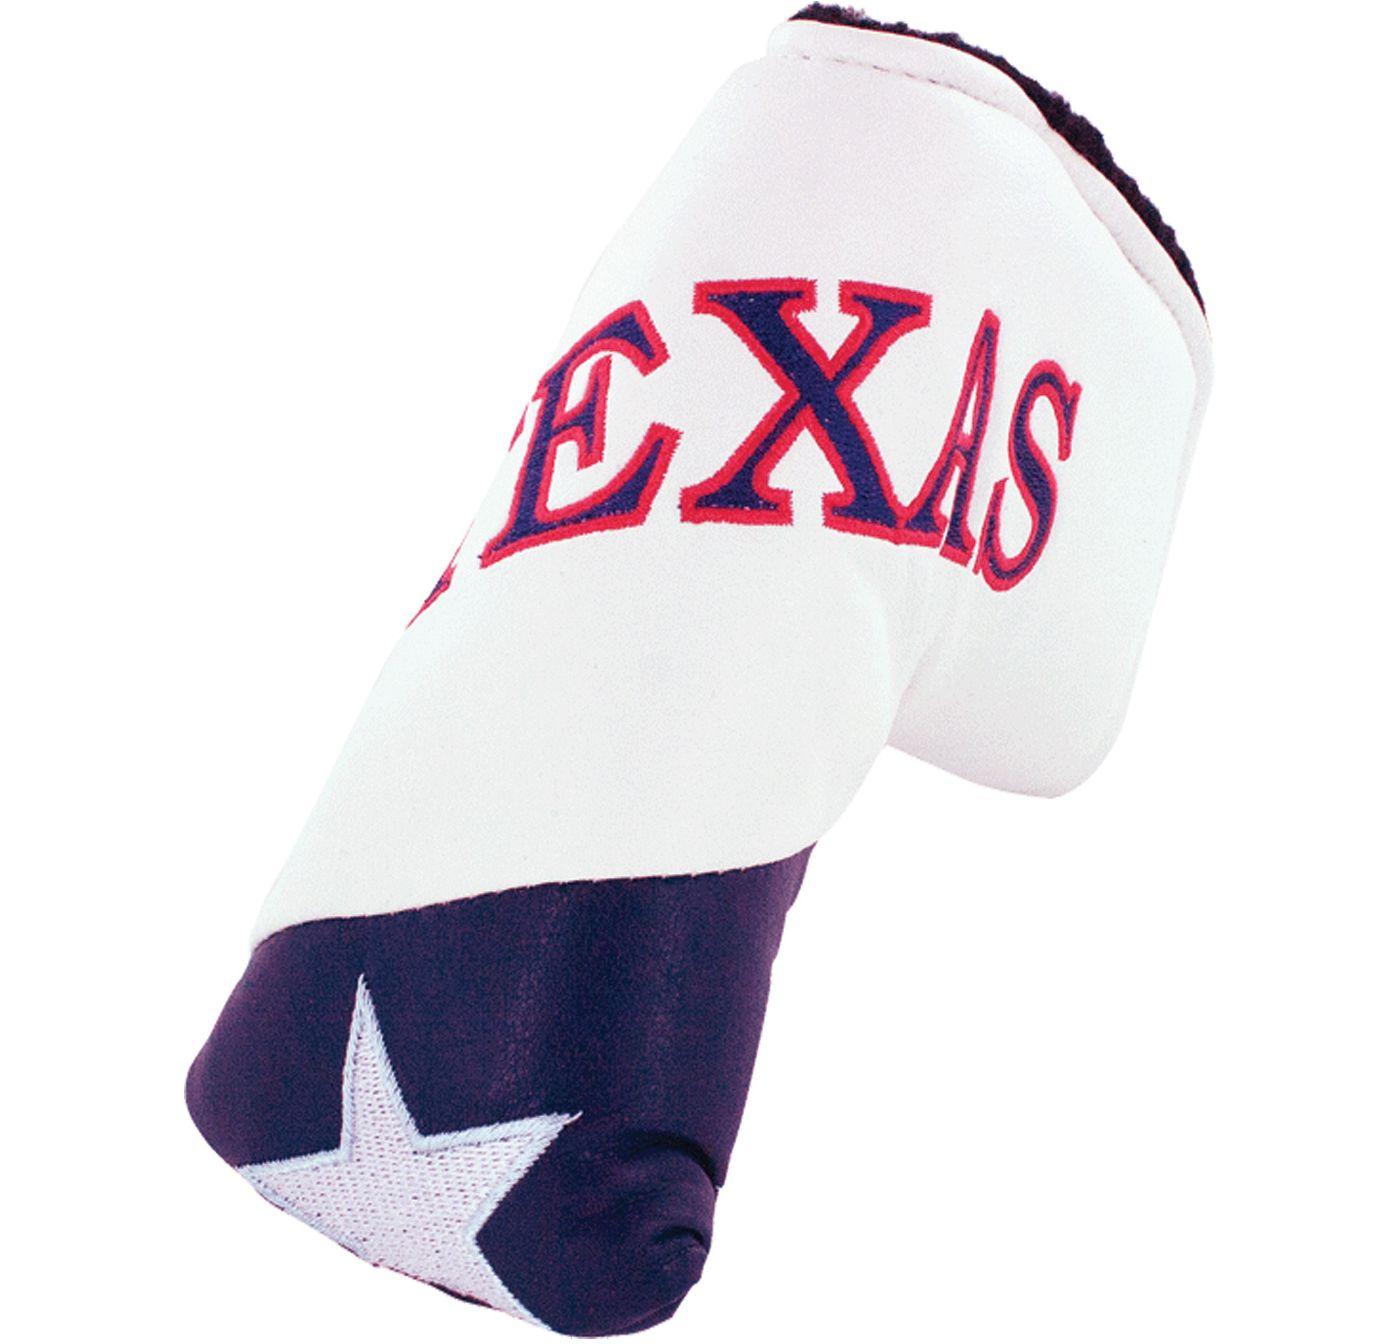 CMC Design Texas Blade Putter Headcover